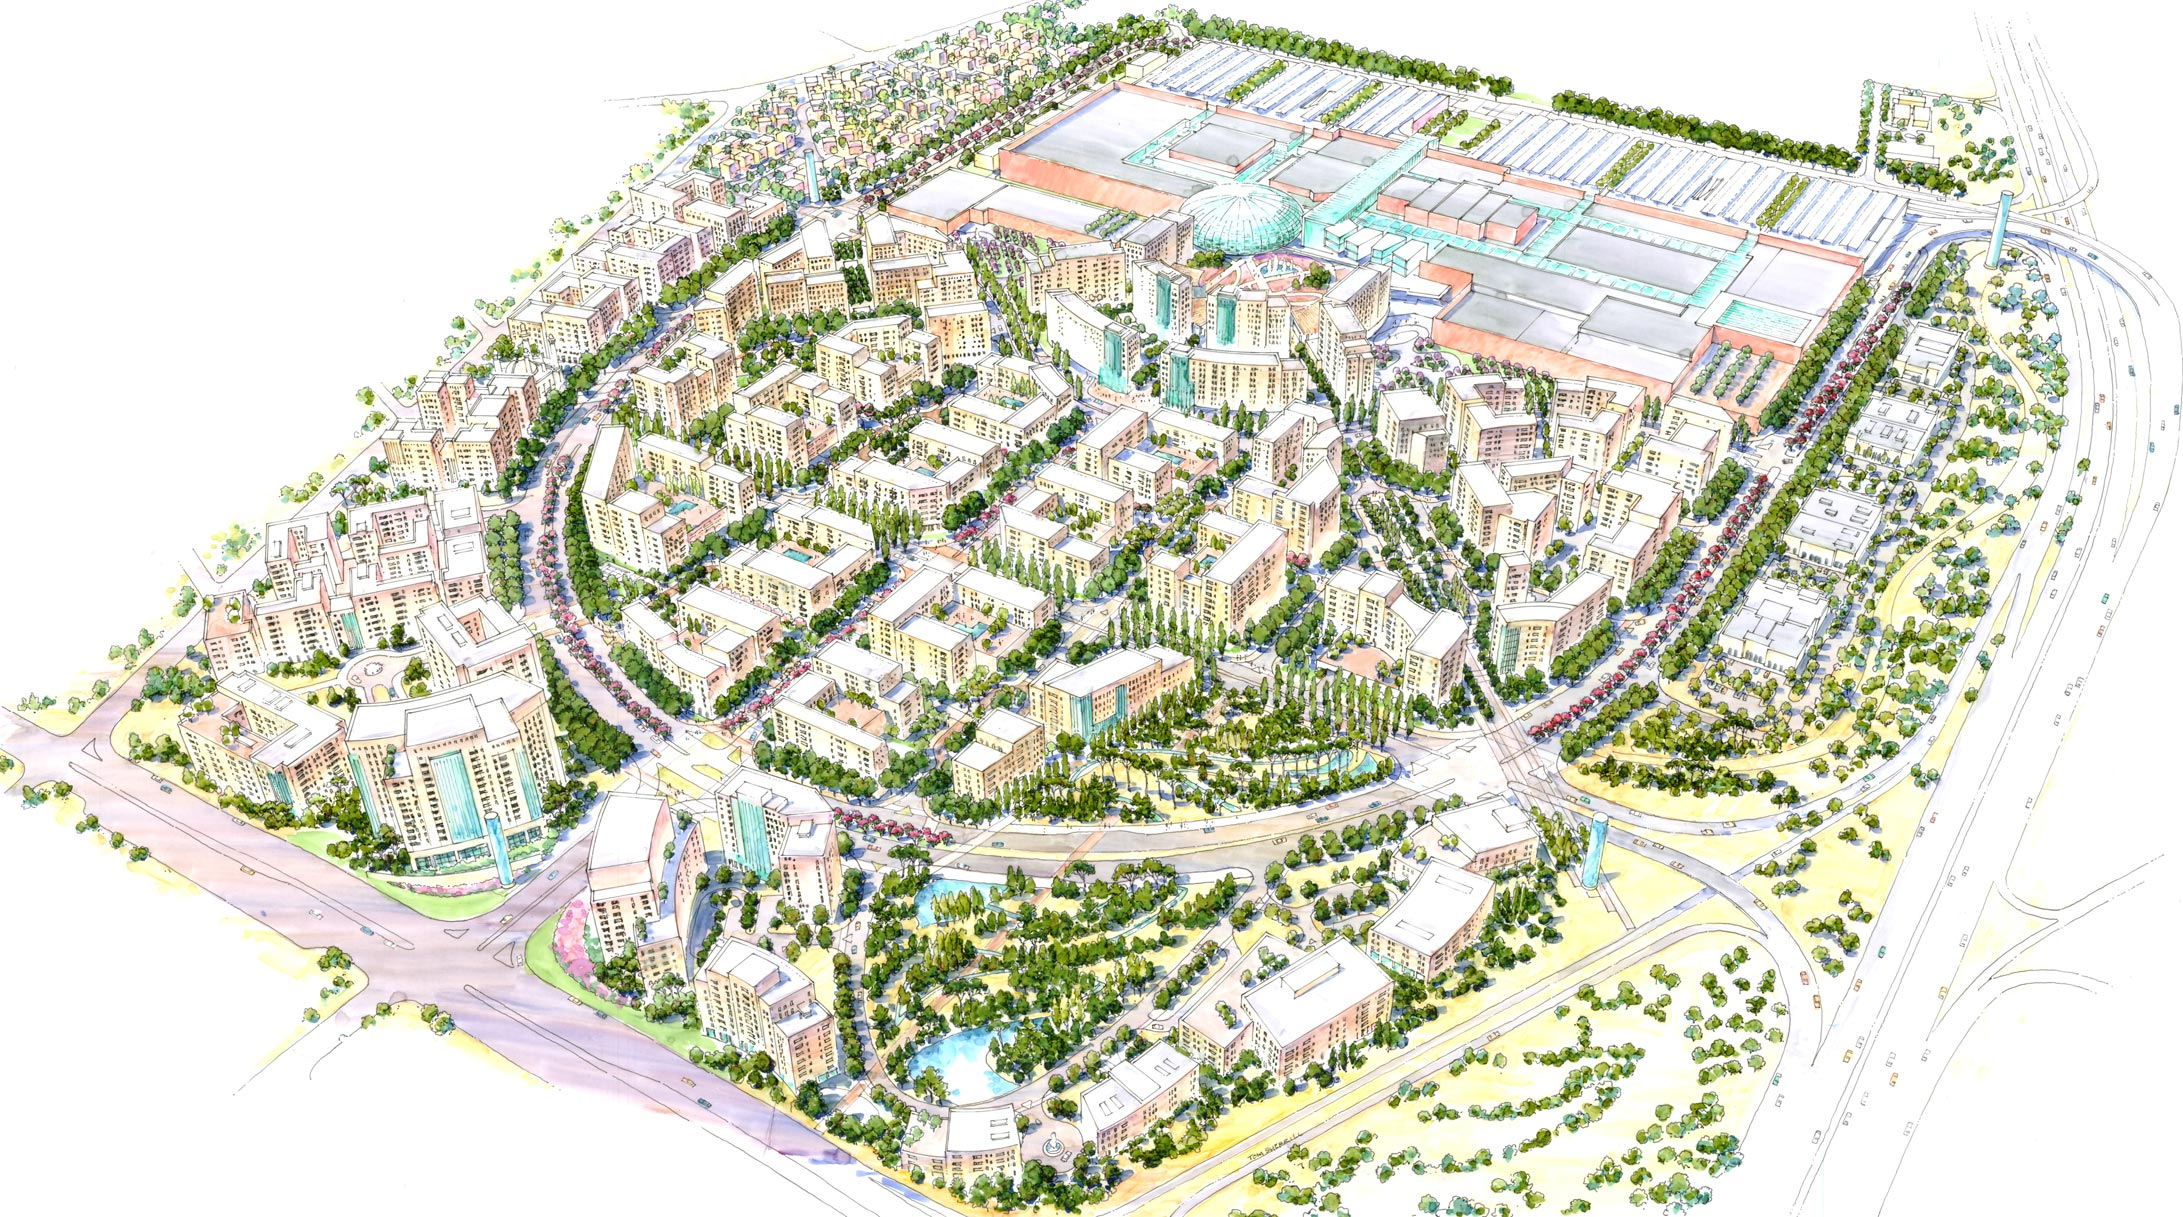 Sabboura-Aerialj.jpg